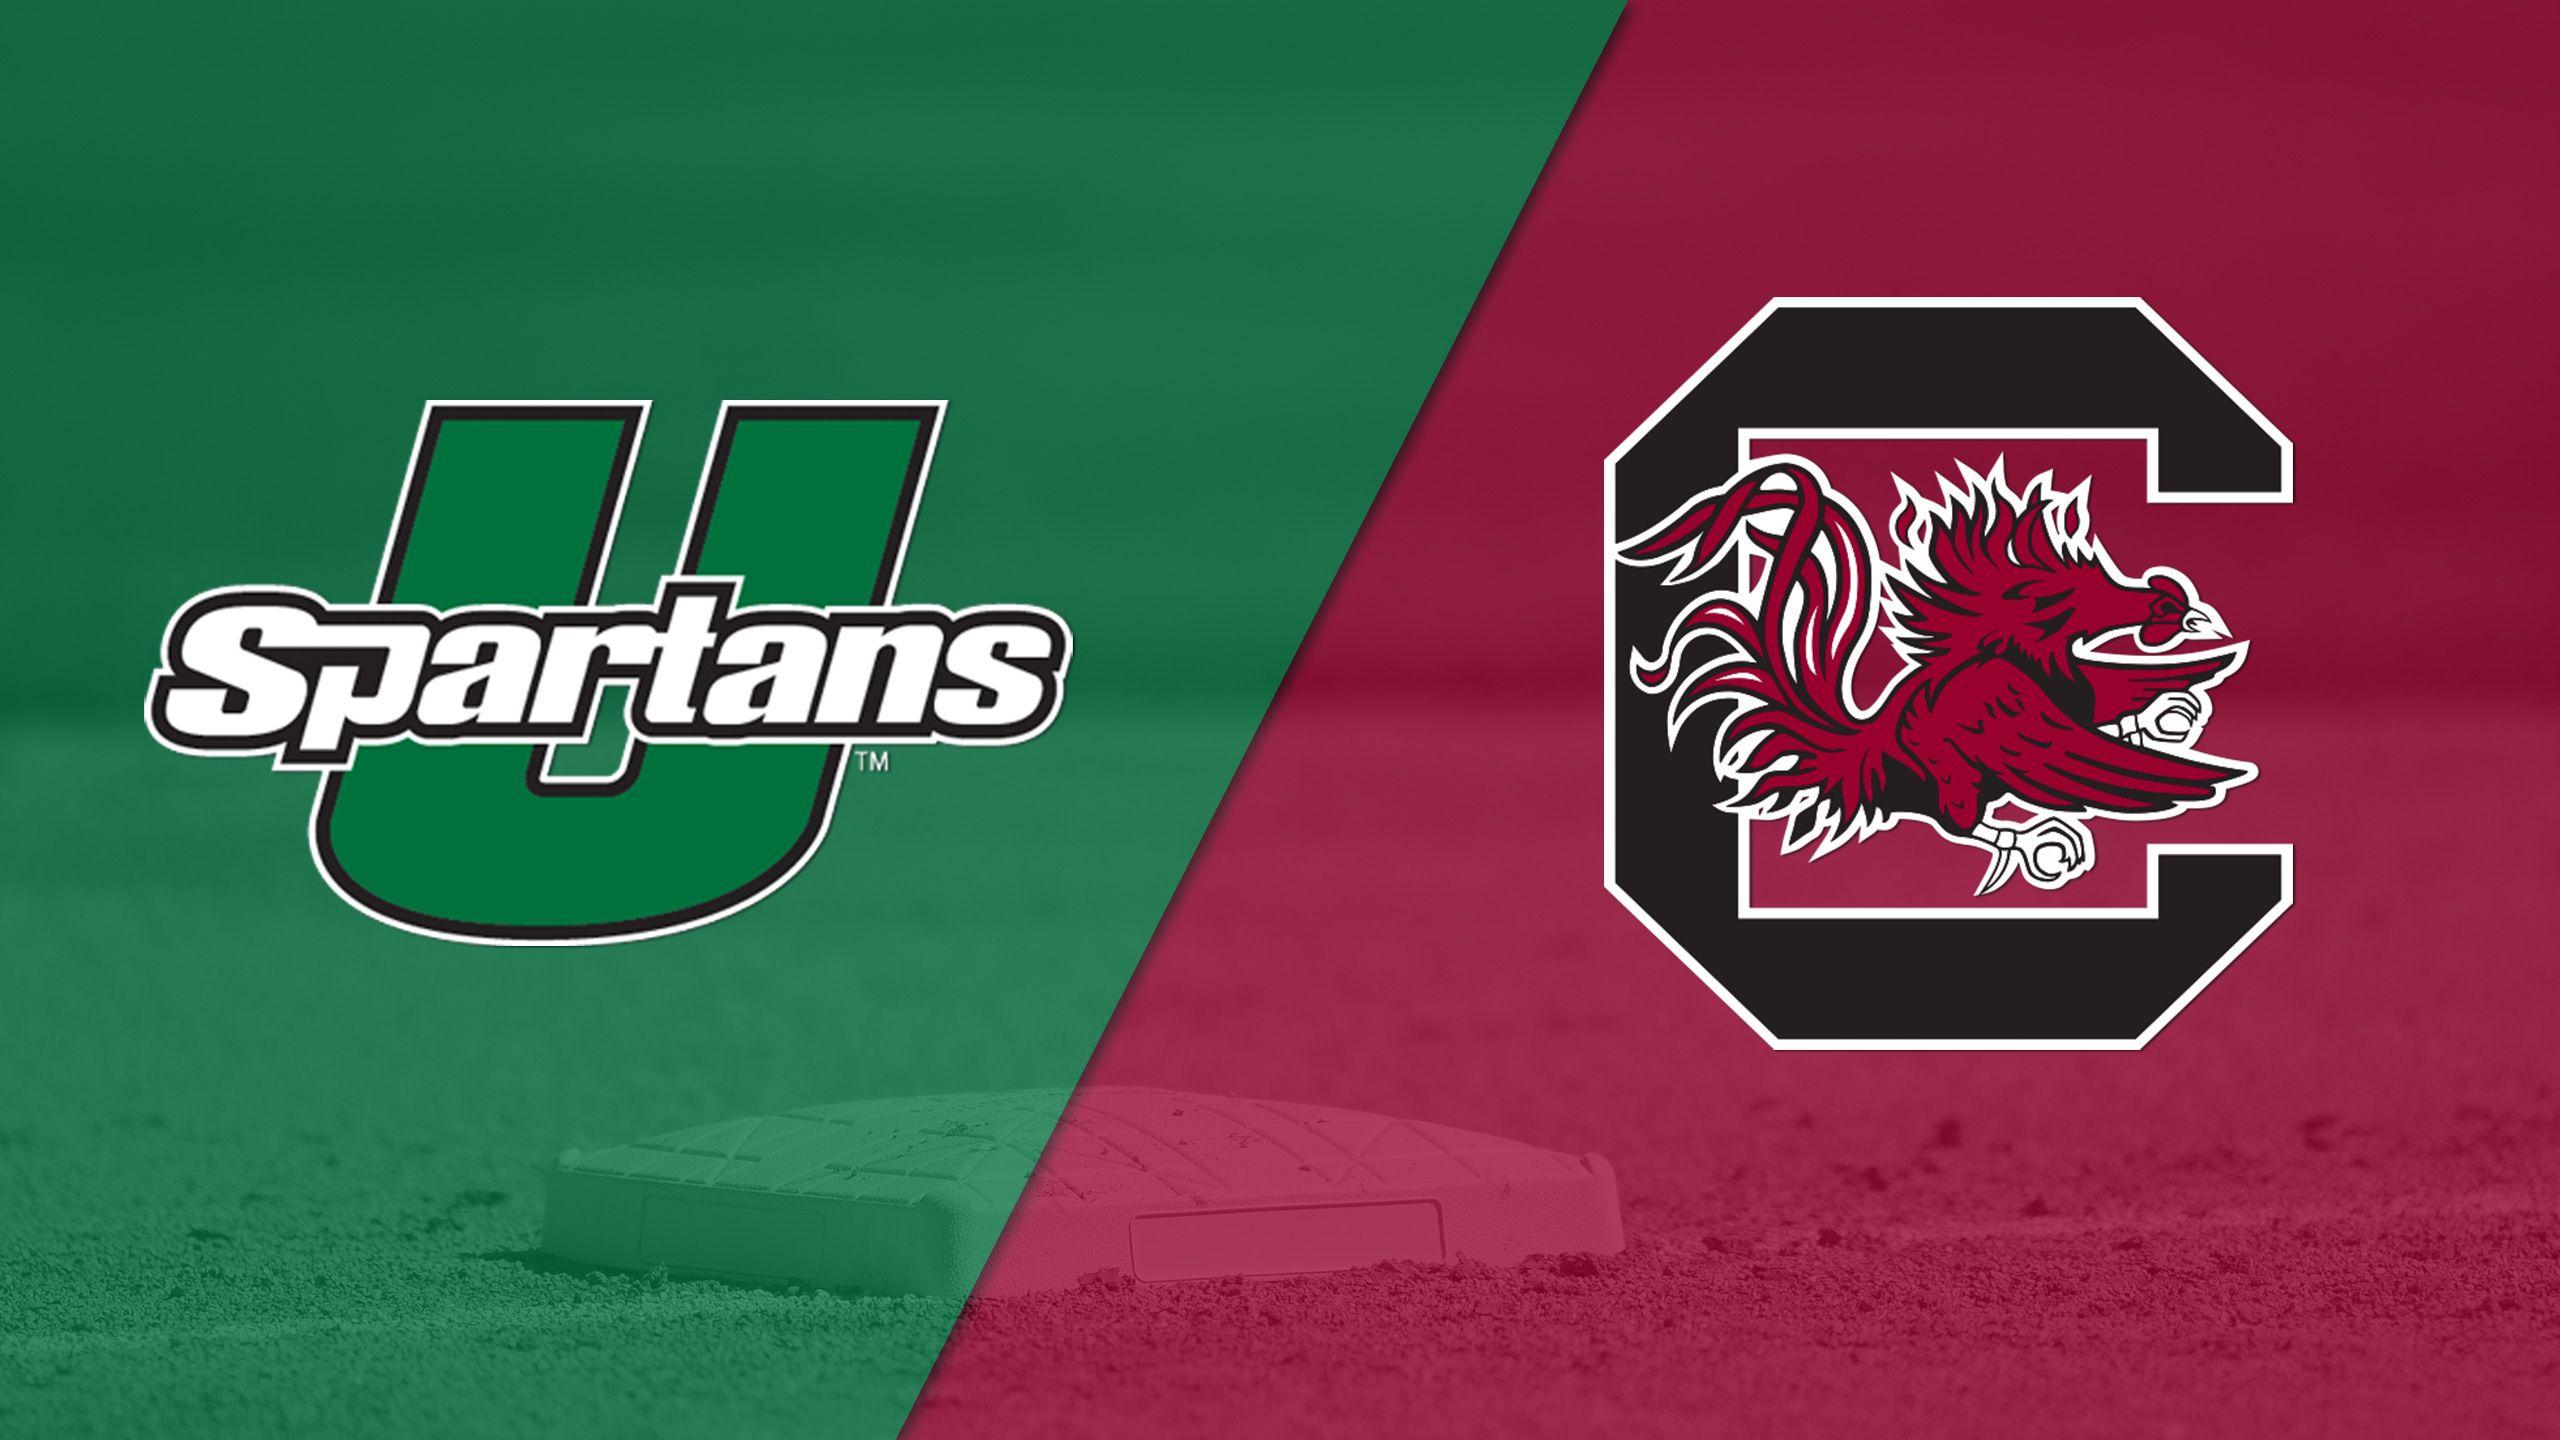 USC Upstate vs. South Carolina (Softball)